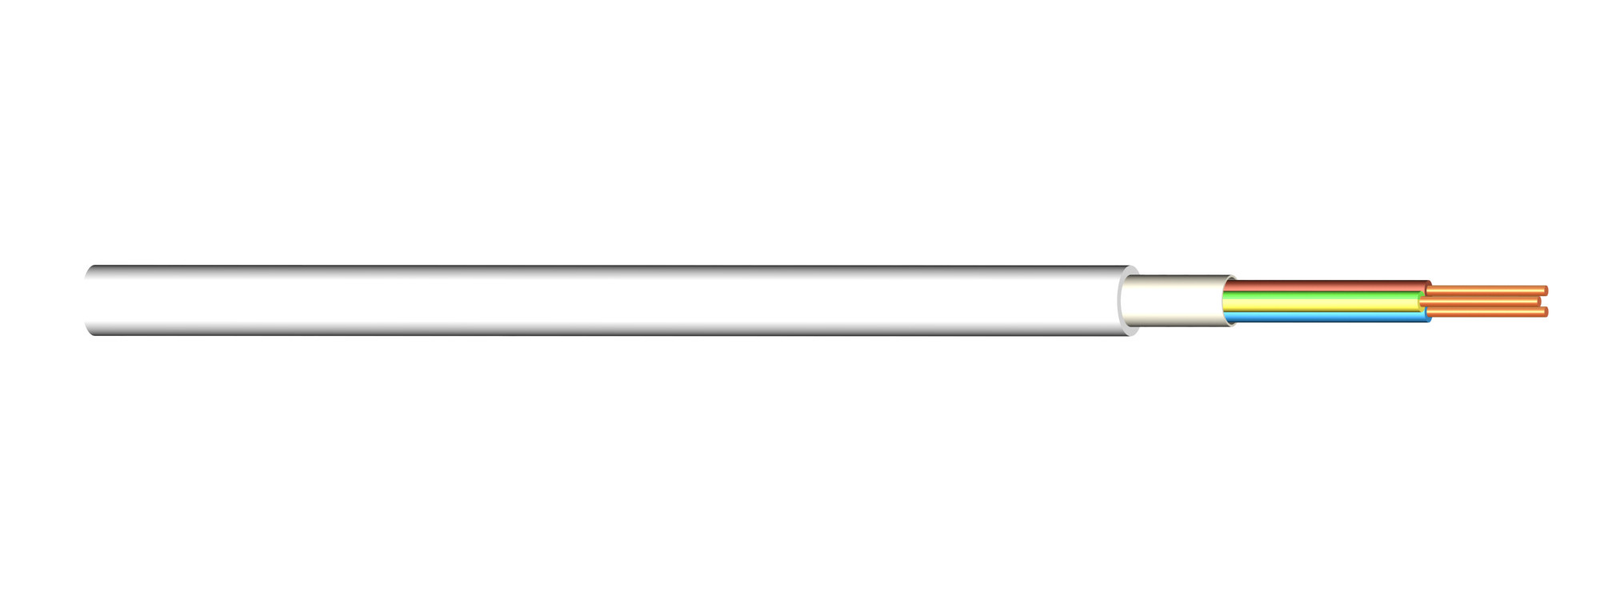 Image of NOIKLX® 90 cable